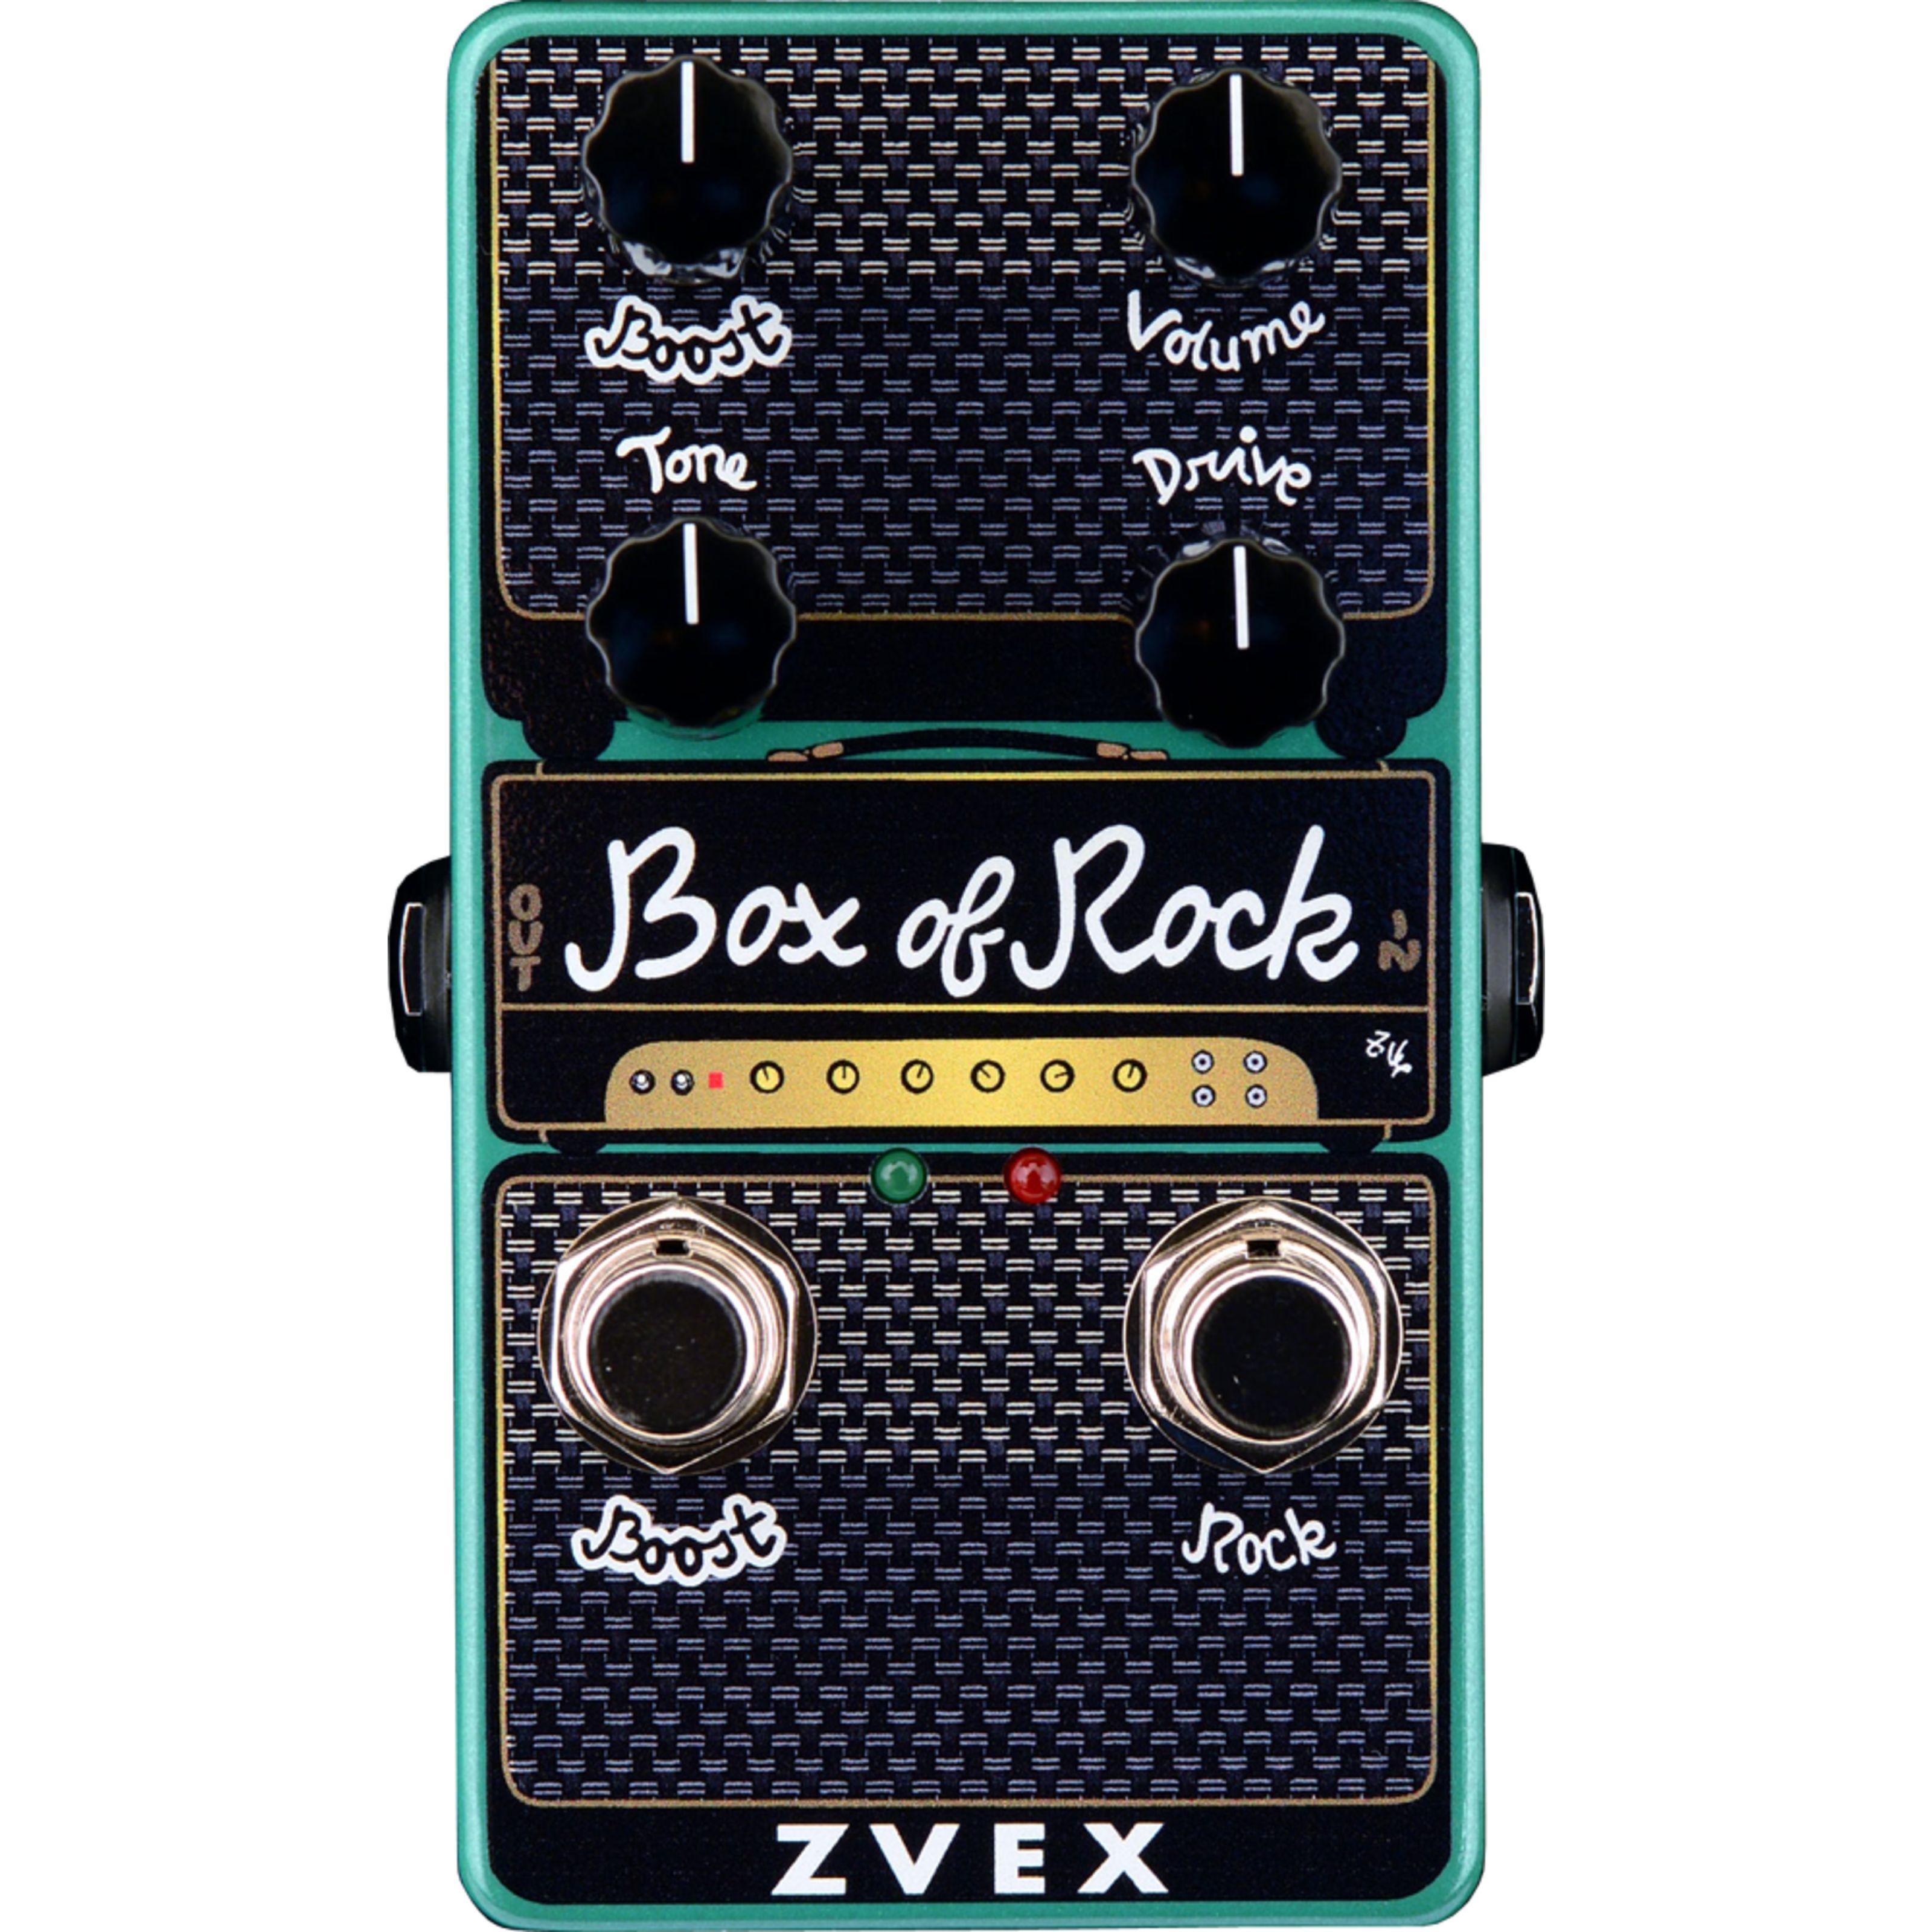 Z.VEX - Box of Rock Vertical 5369